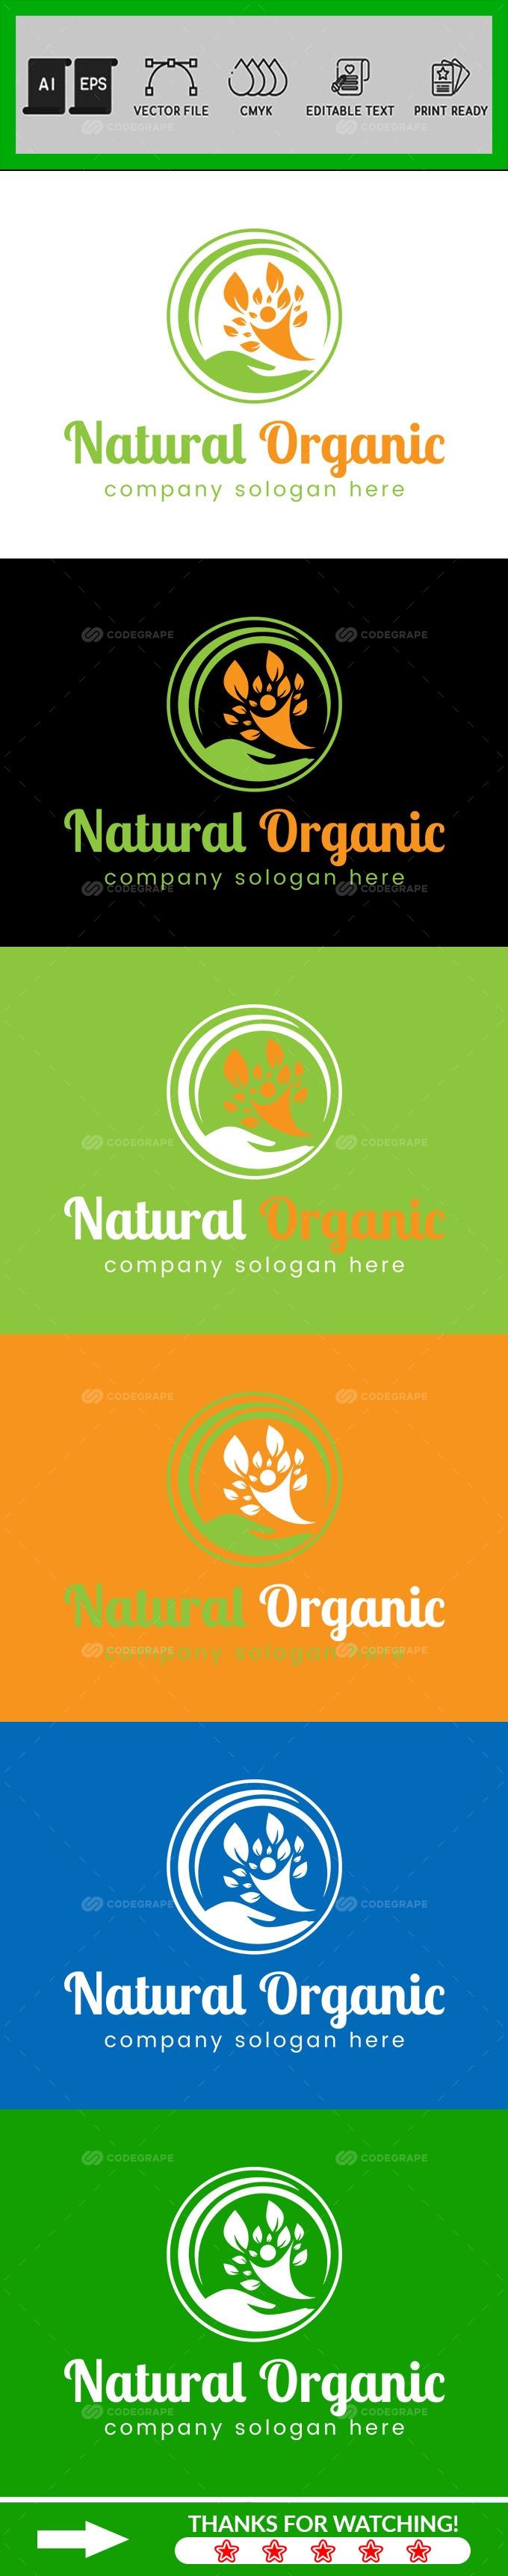 Natural Organic Logo Design Template